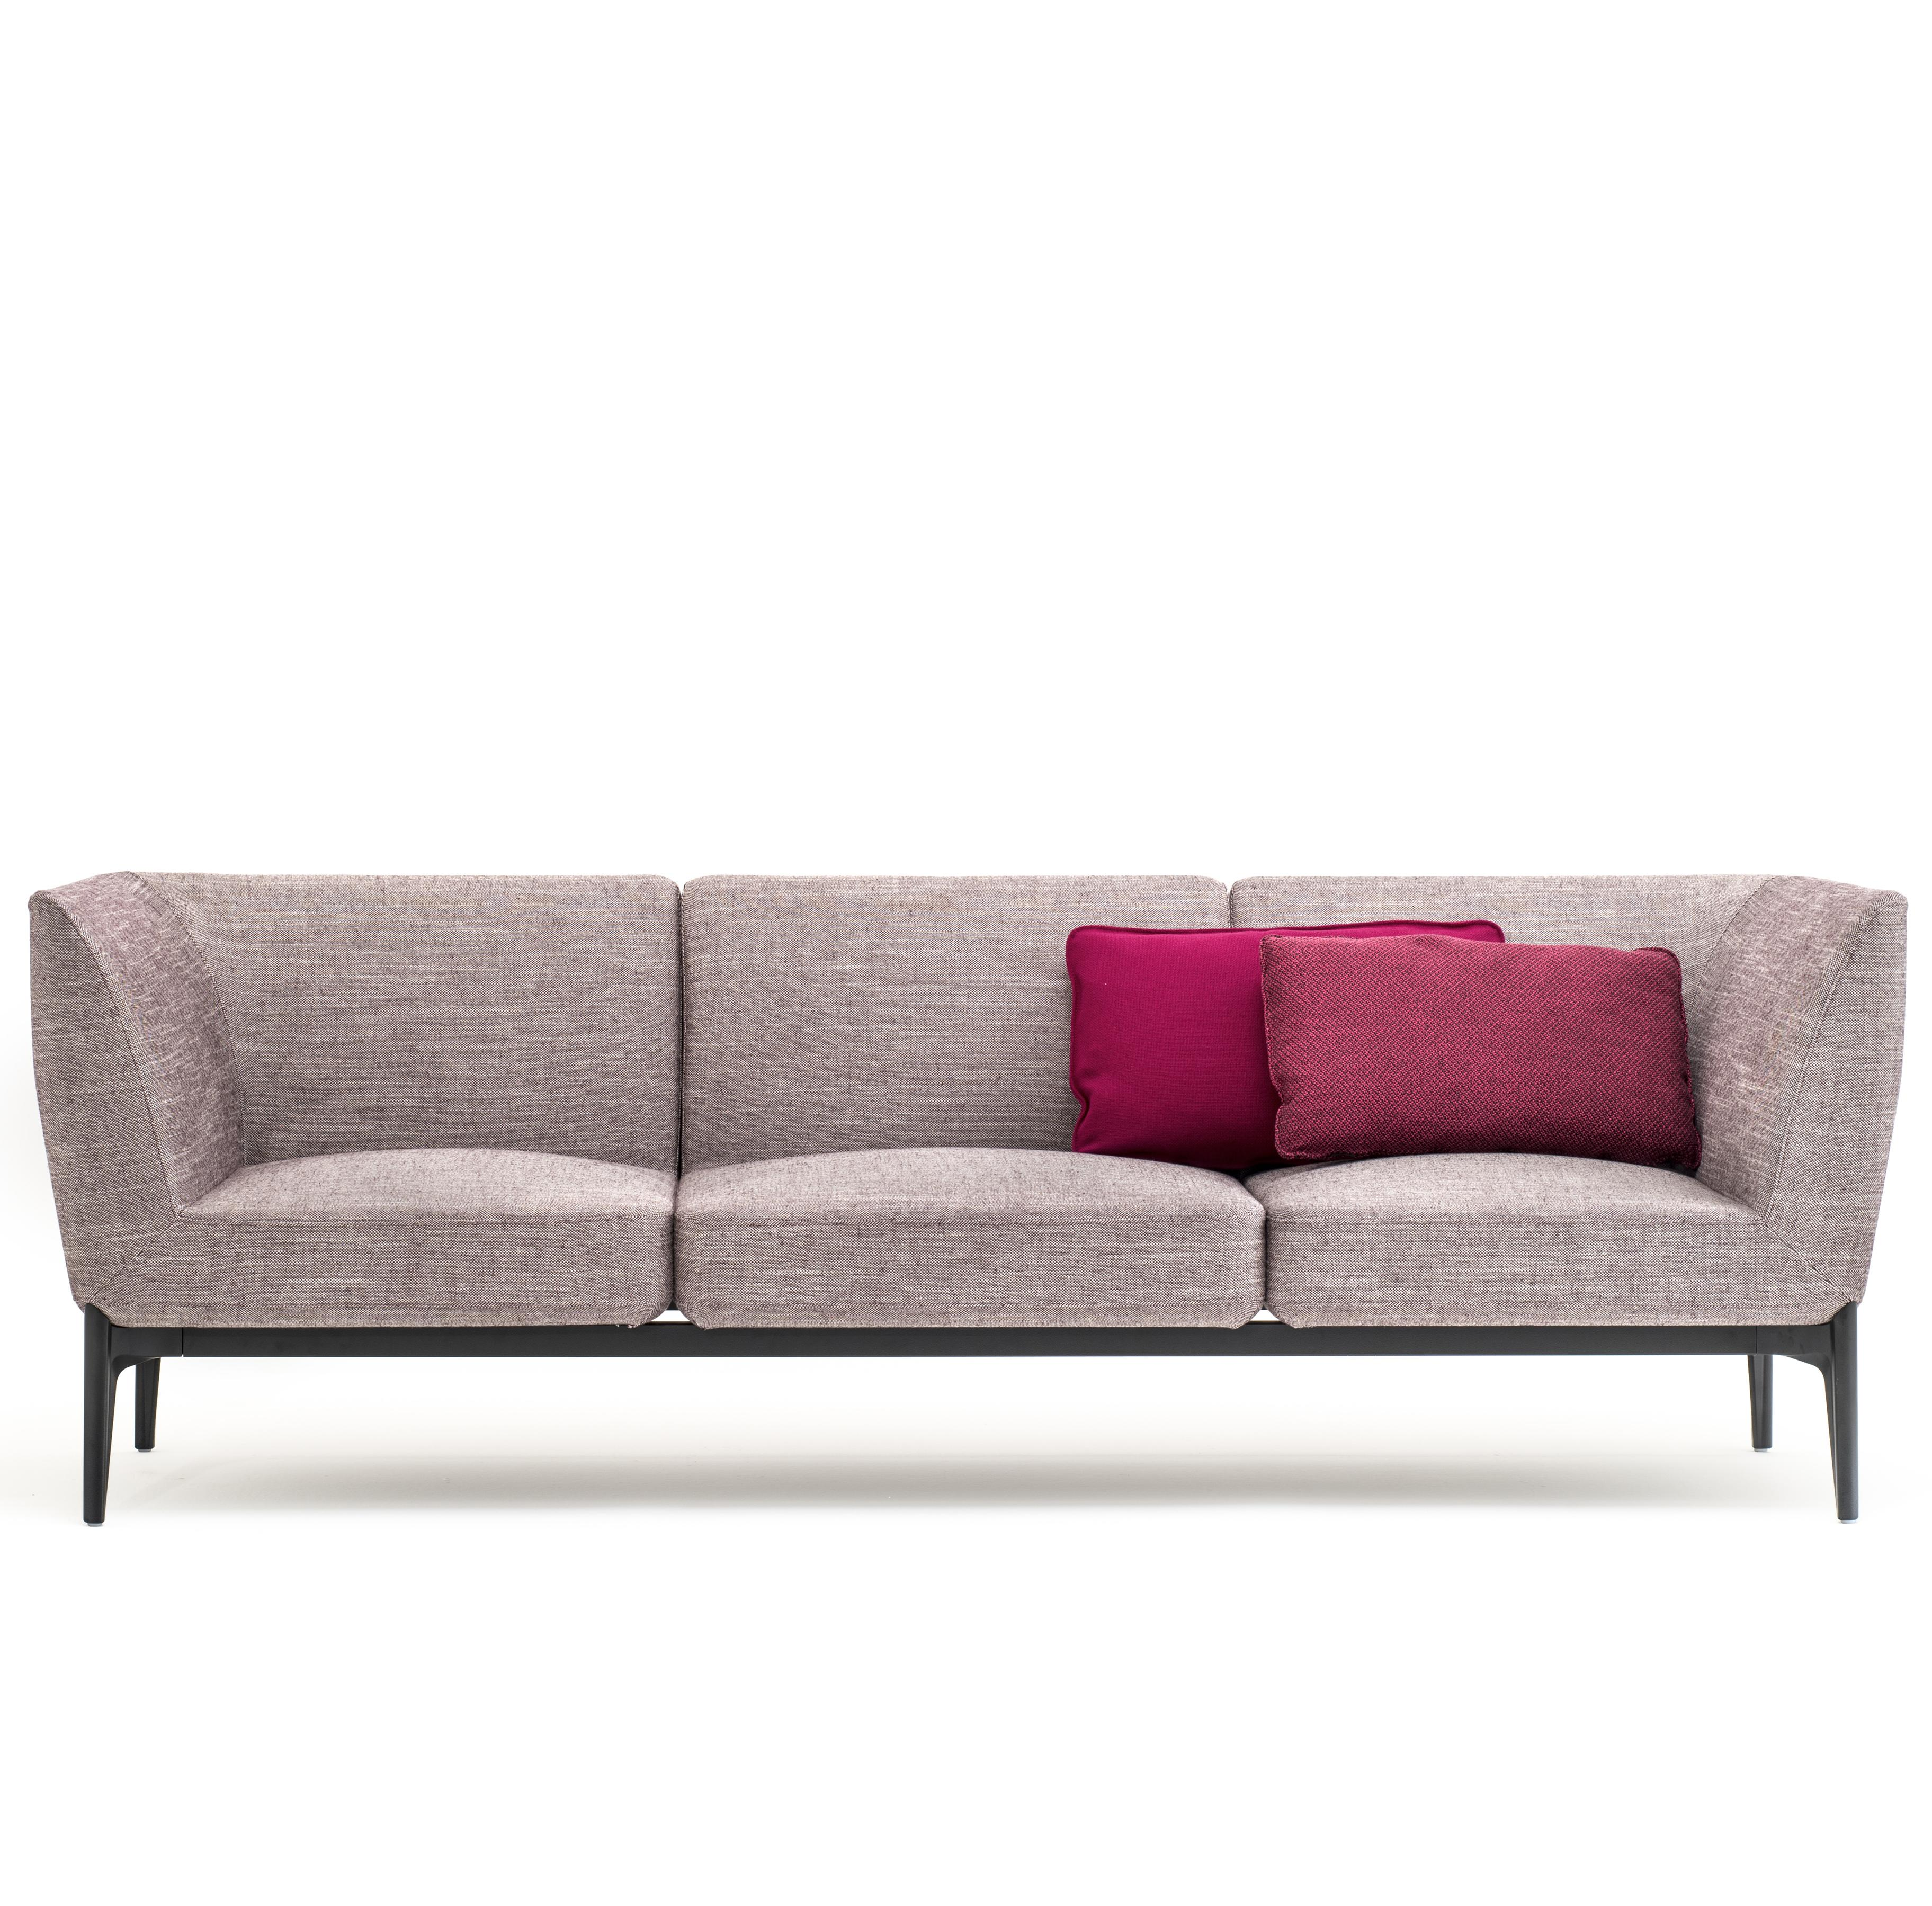 Designerska sofa SOCIAL Pedrali